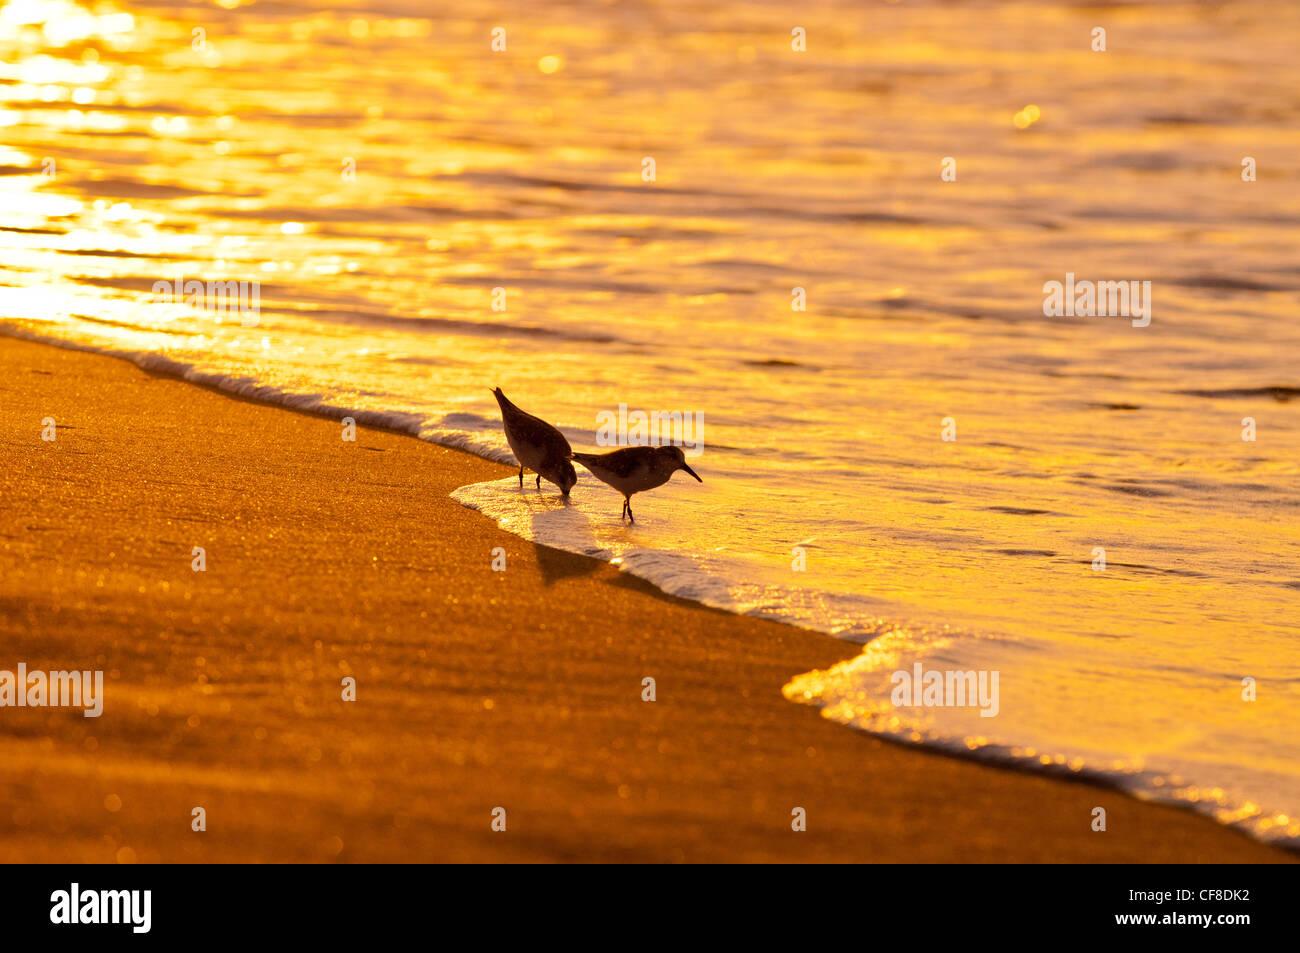 Sanderlinge-'Hunakai' in der hawaiianischen Sprache (Calidris Alba), Polihale Beach, Kauai, Hawaii Stockfoto